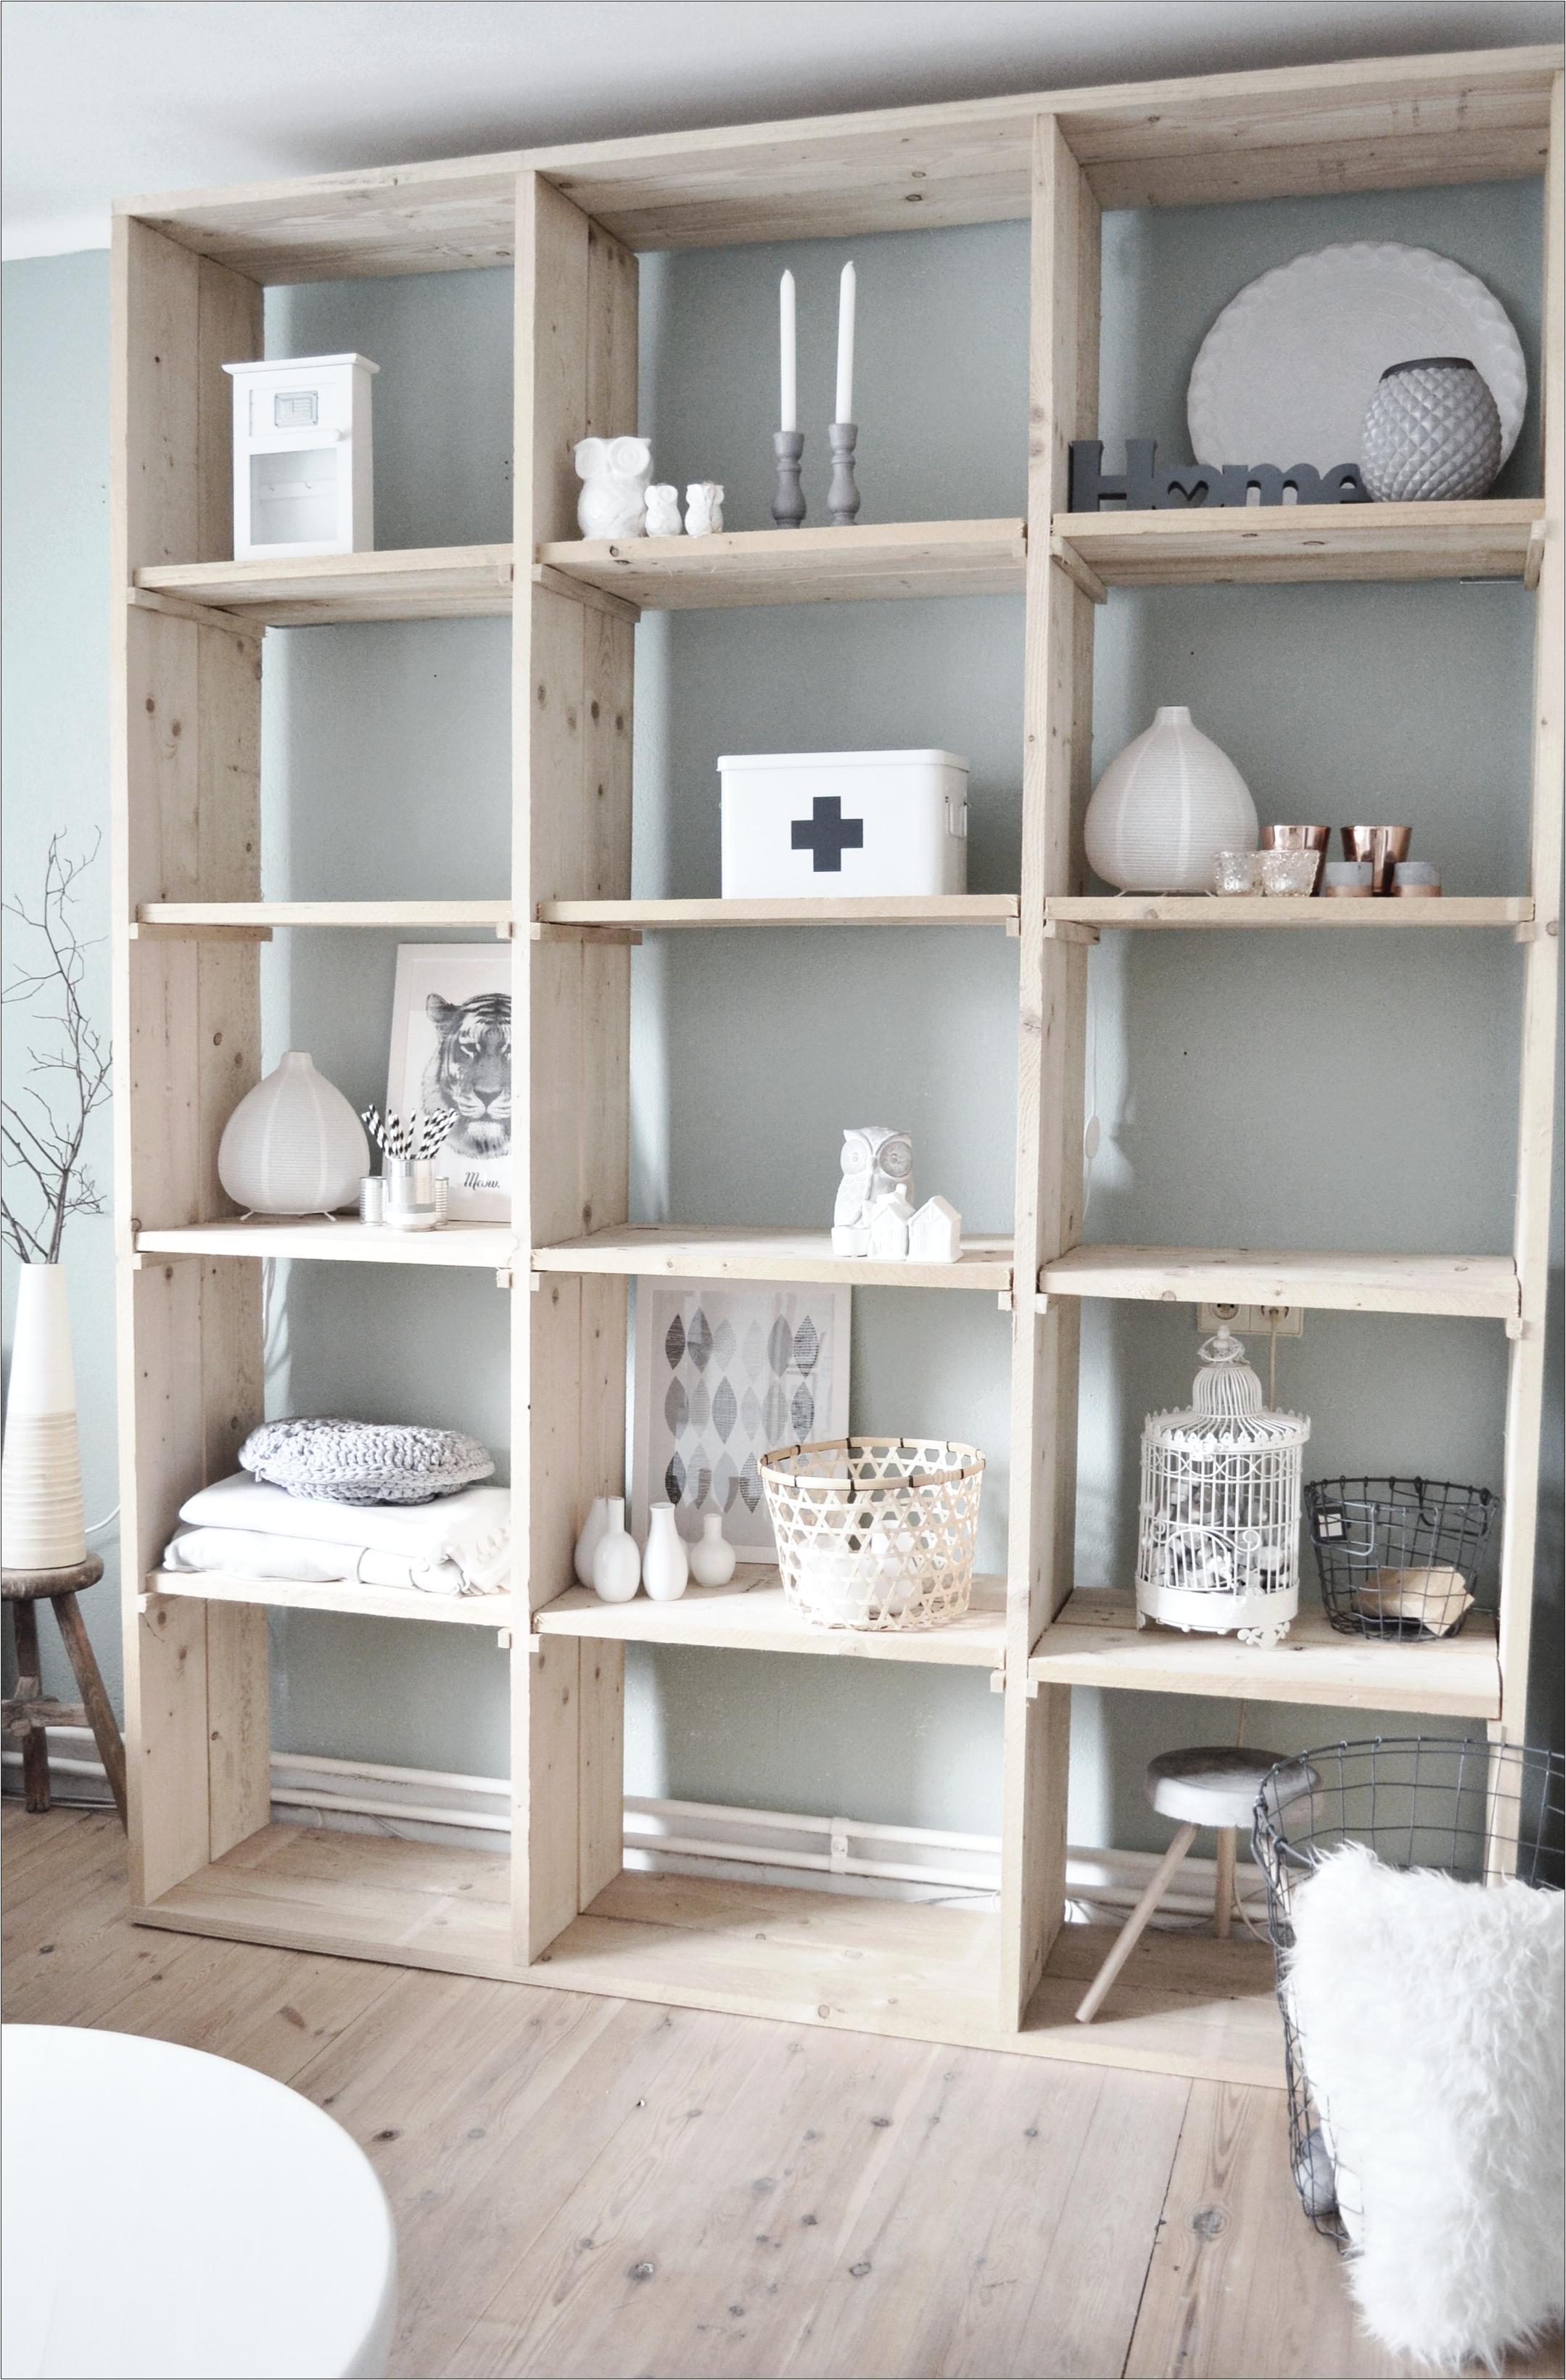 diy furniture inspirational furniture bookshelf decor inspirational diy wooden bookshelf c2a2 jpg